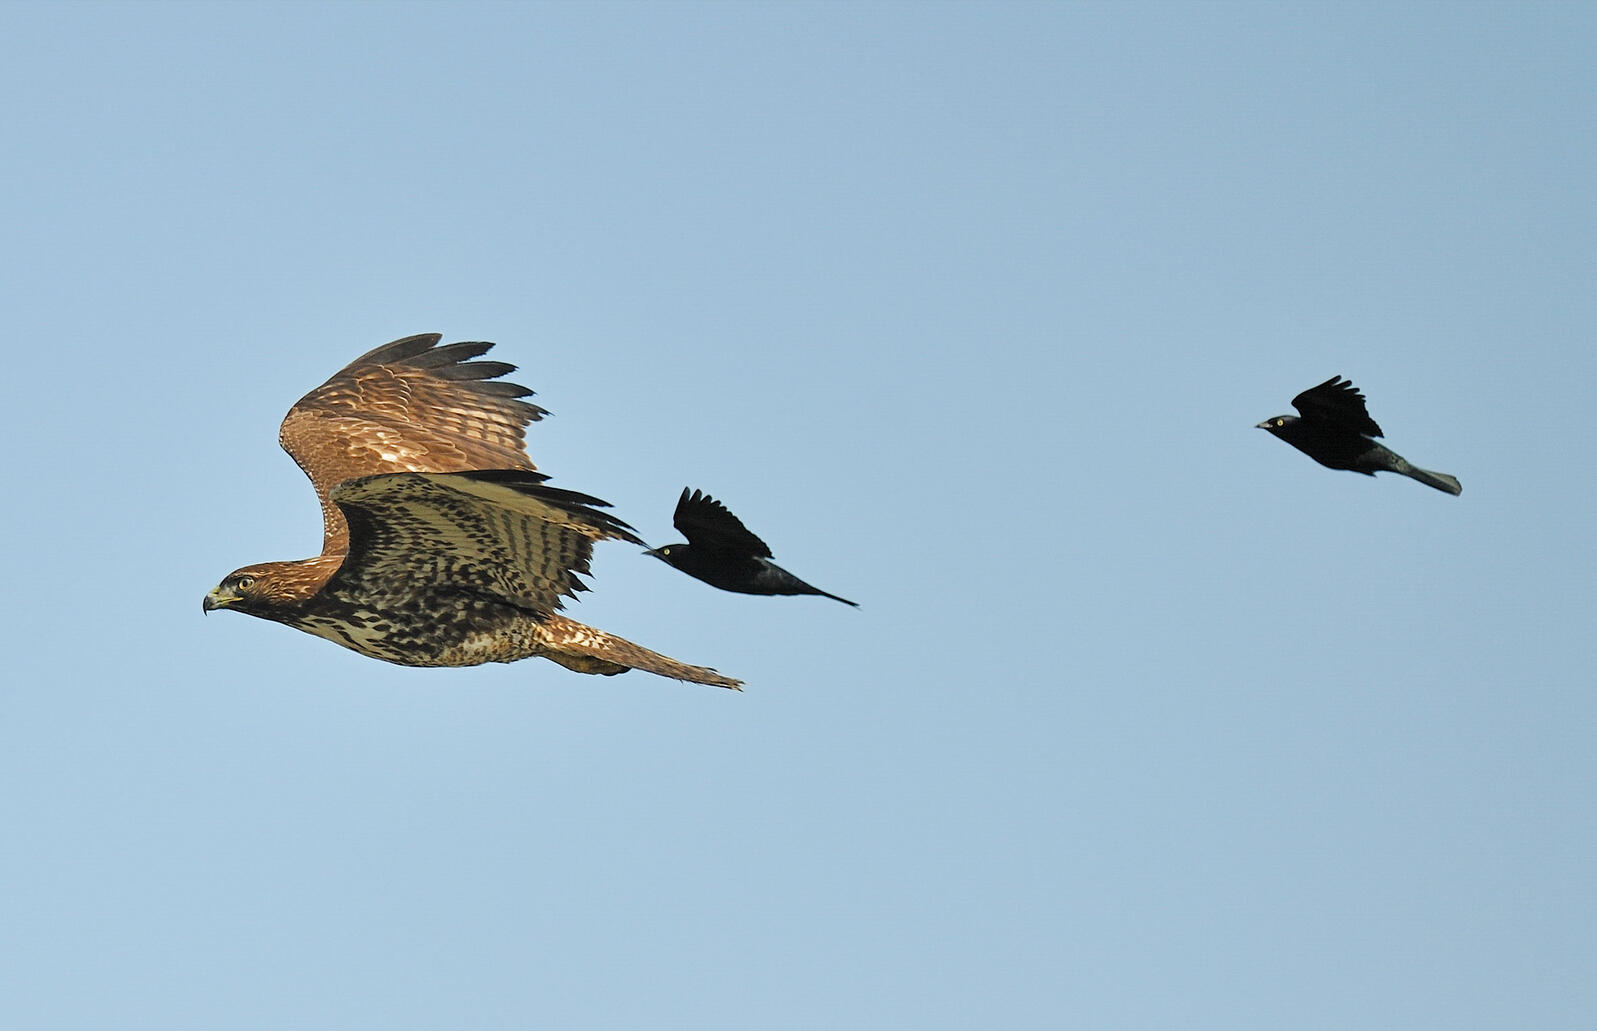 Red-tailed Hawk and Brewer's Blackbirds. Donald Metzner/Great Backyard Bird Count